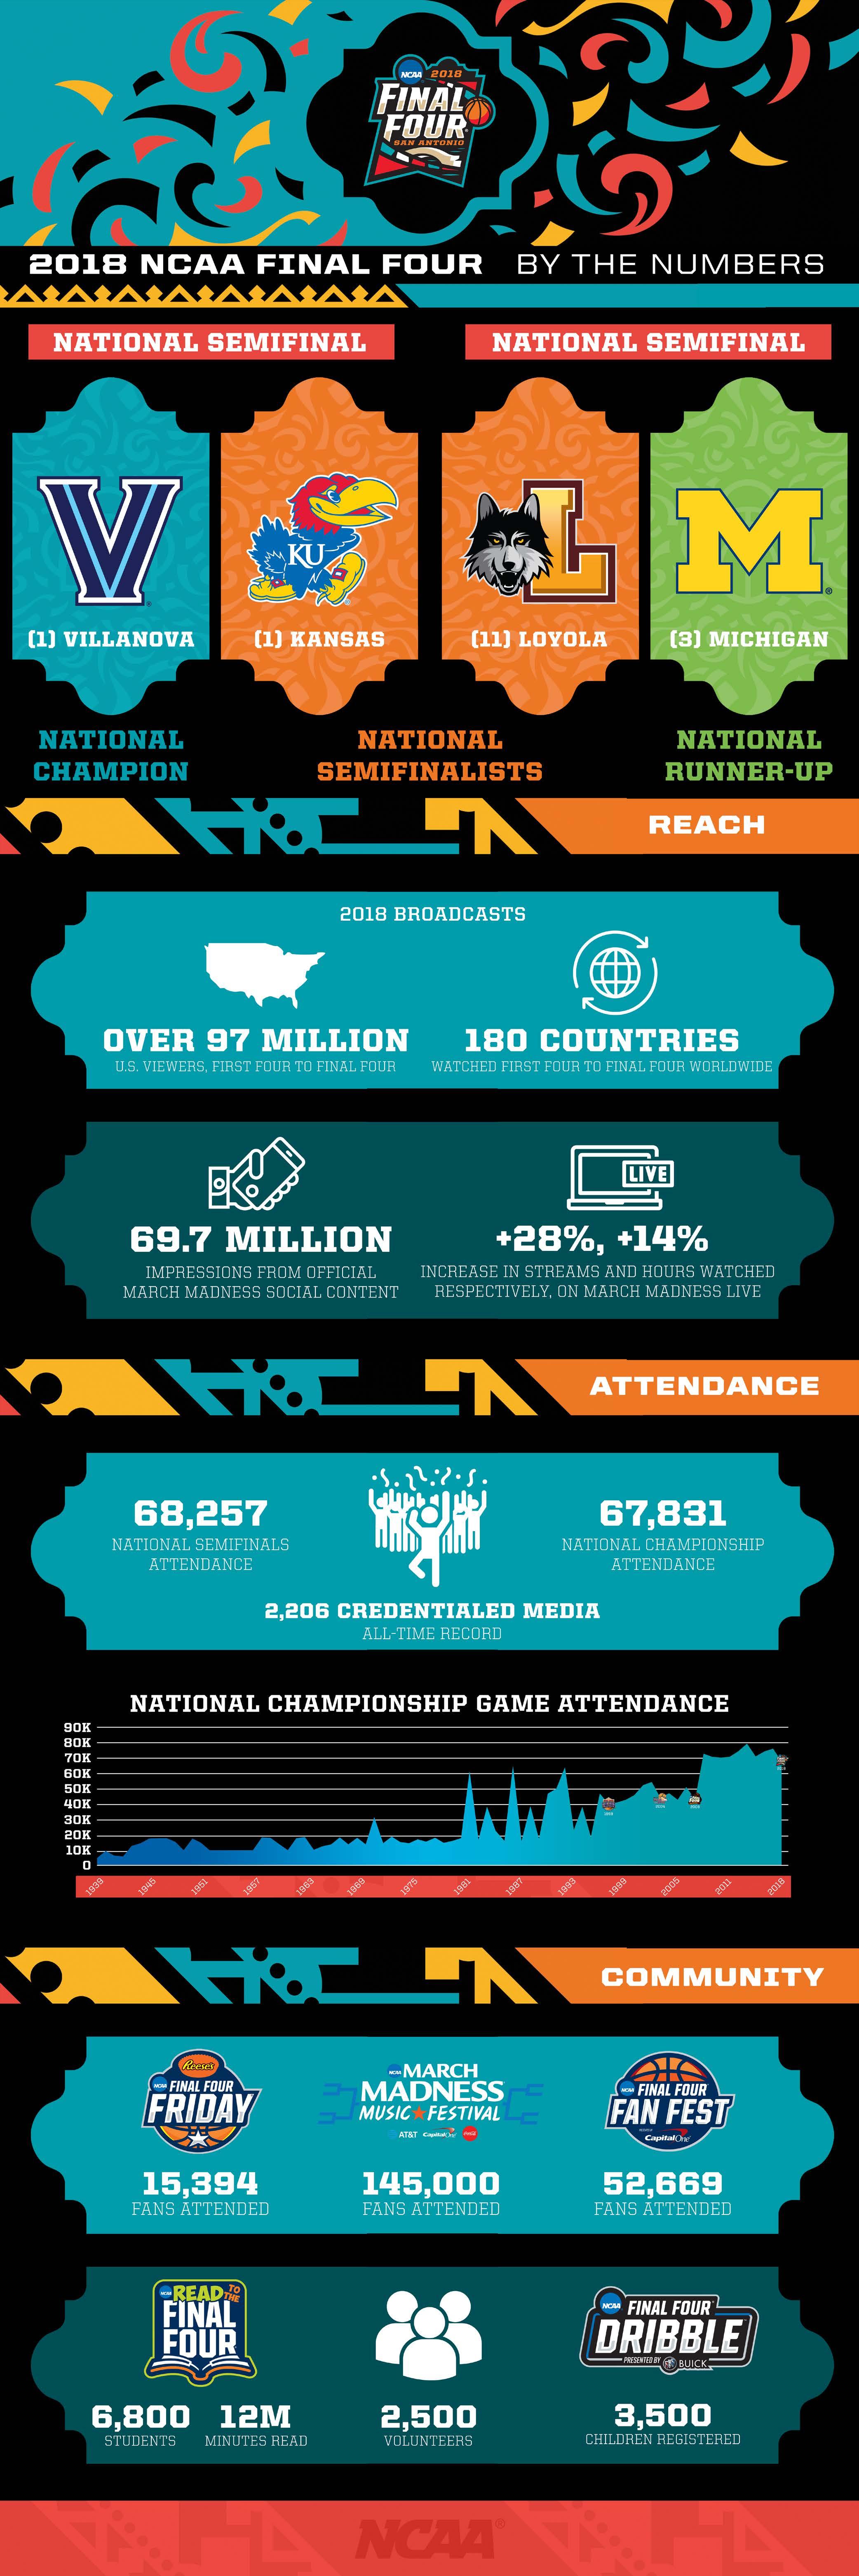 2018 Ncaa Tournament Viewership Attendance Numbers Ncaa Com